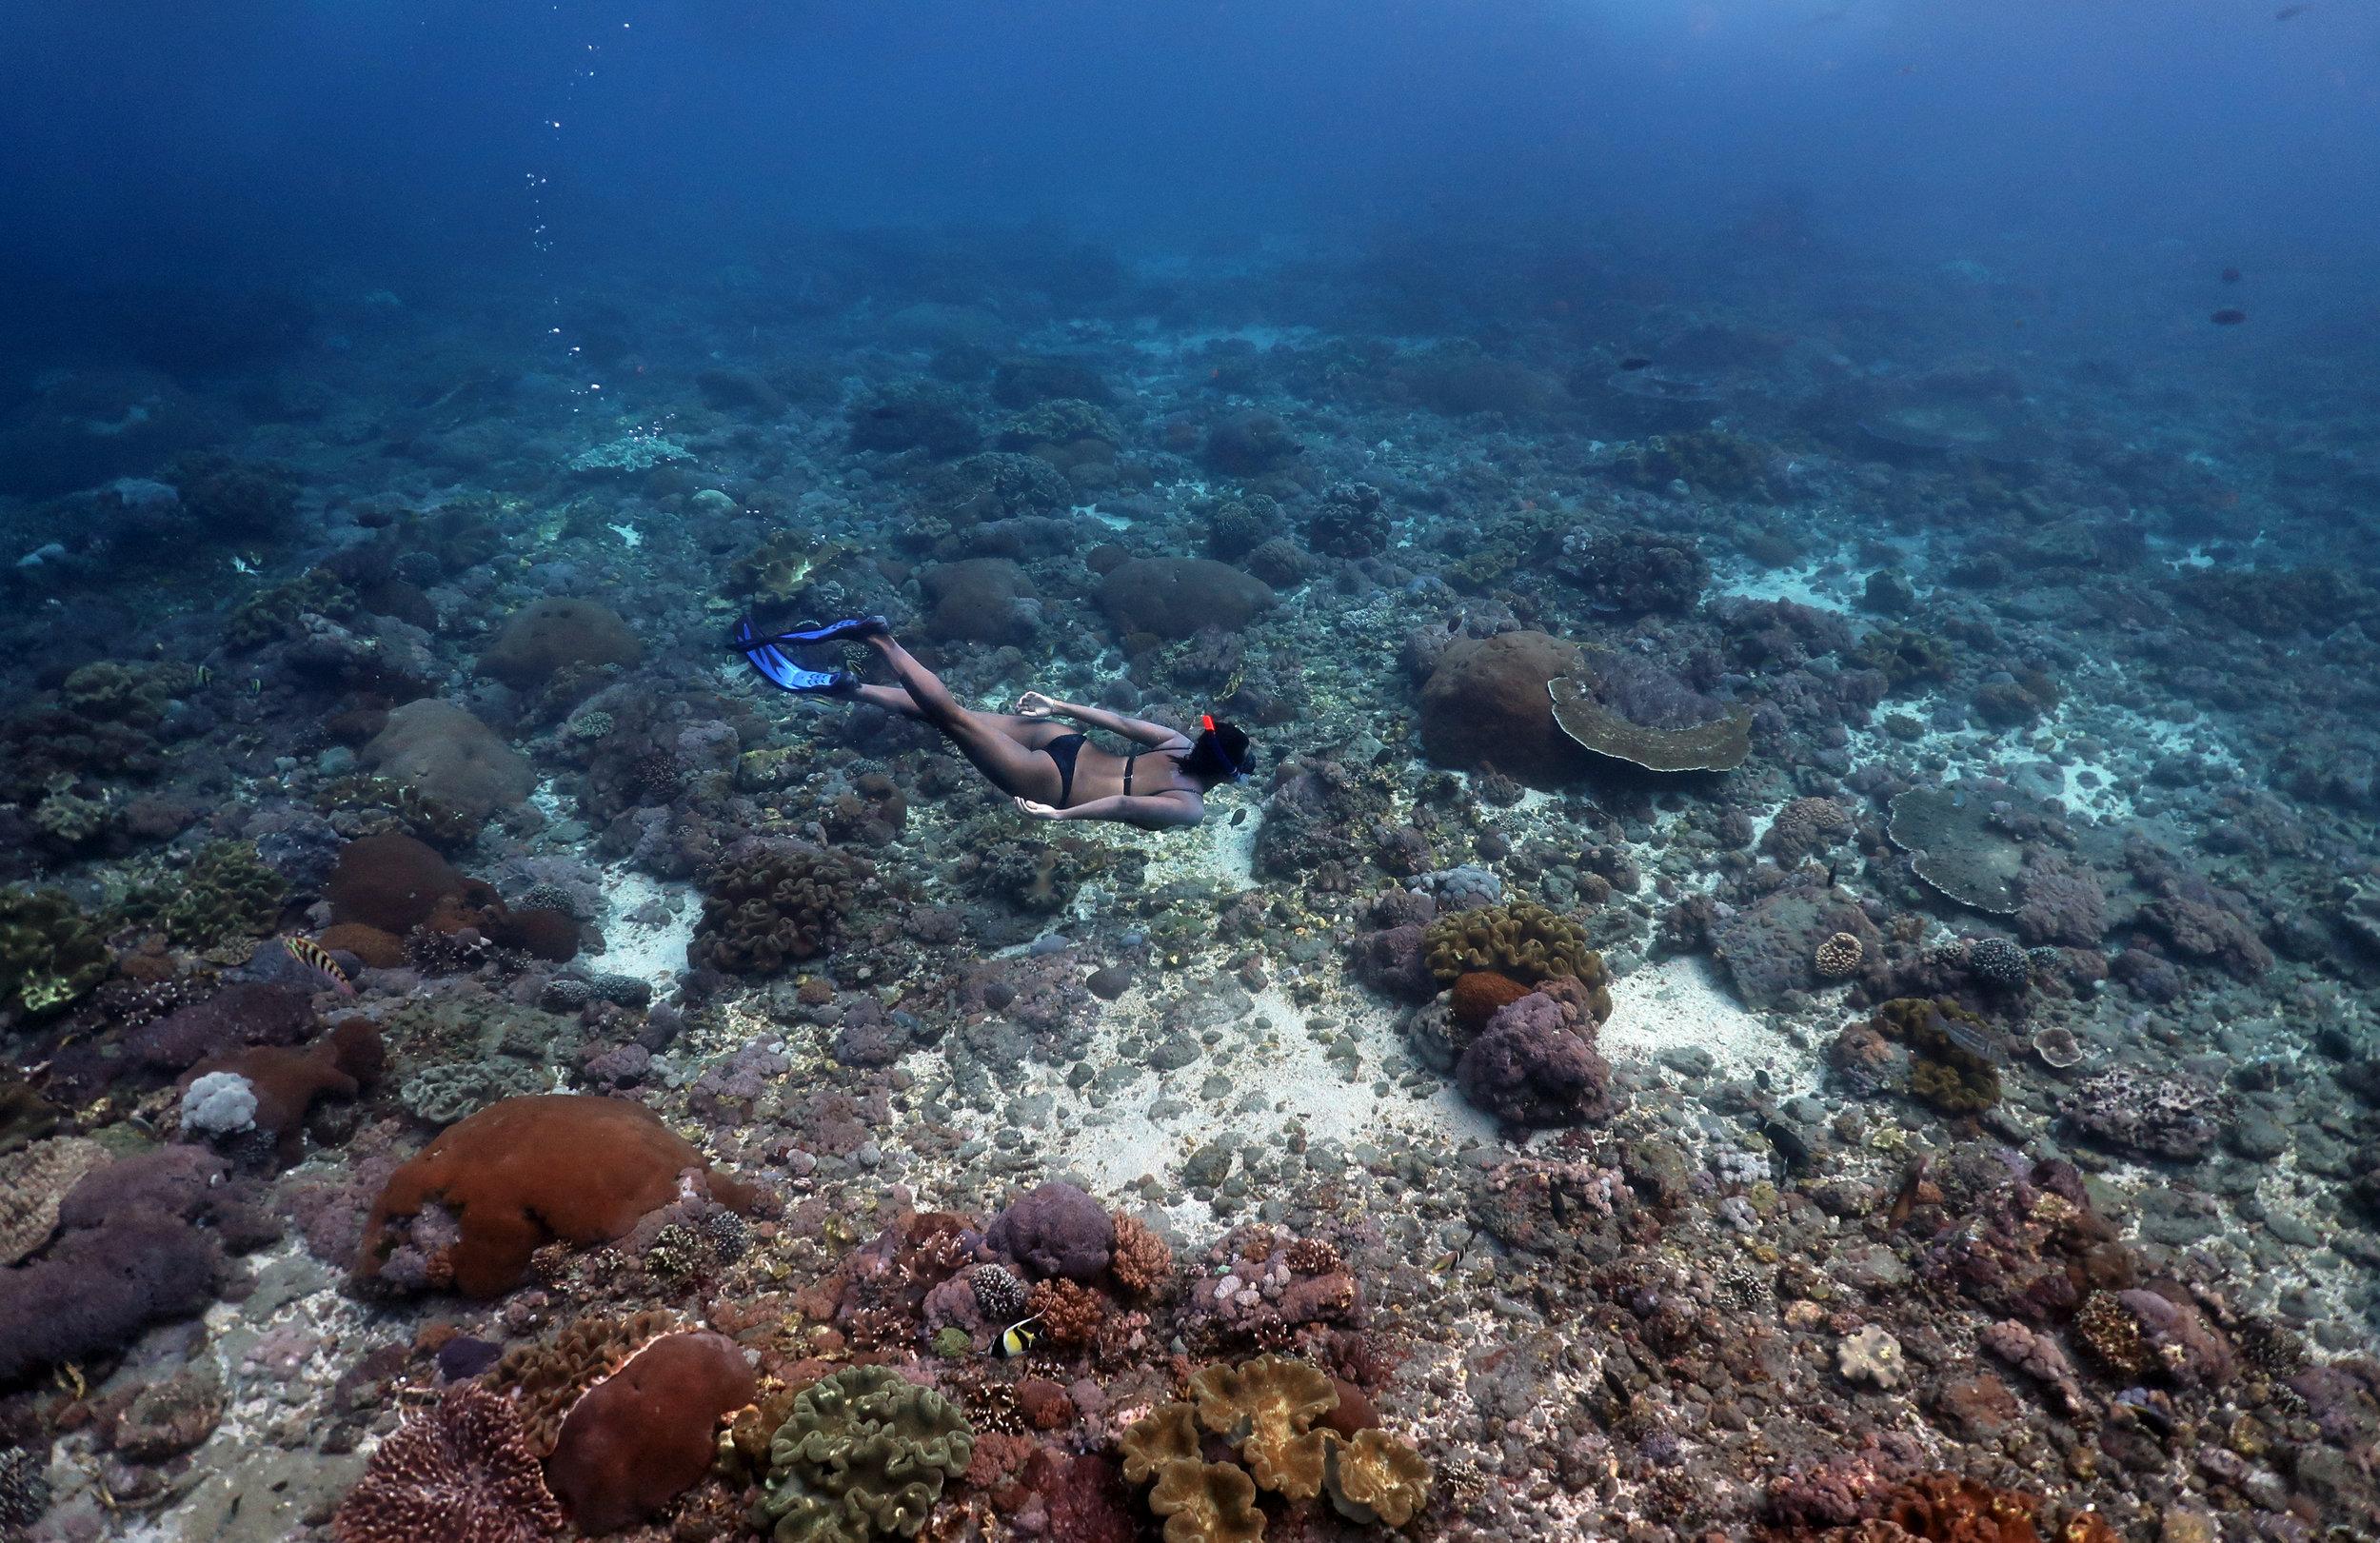 freediver in nusa penida credit: Anett Szaszi / coral reef image bank